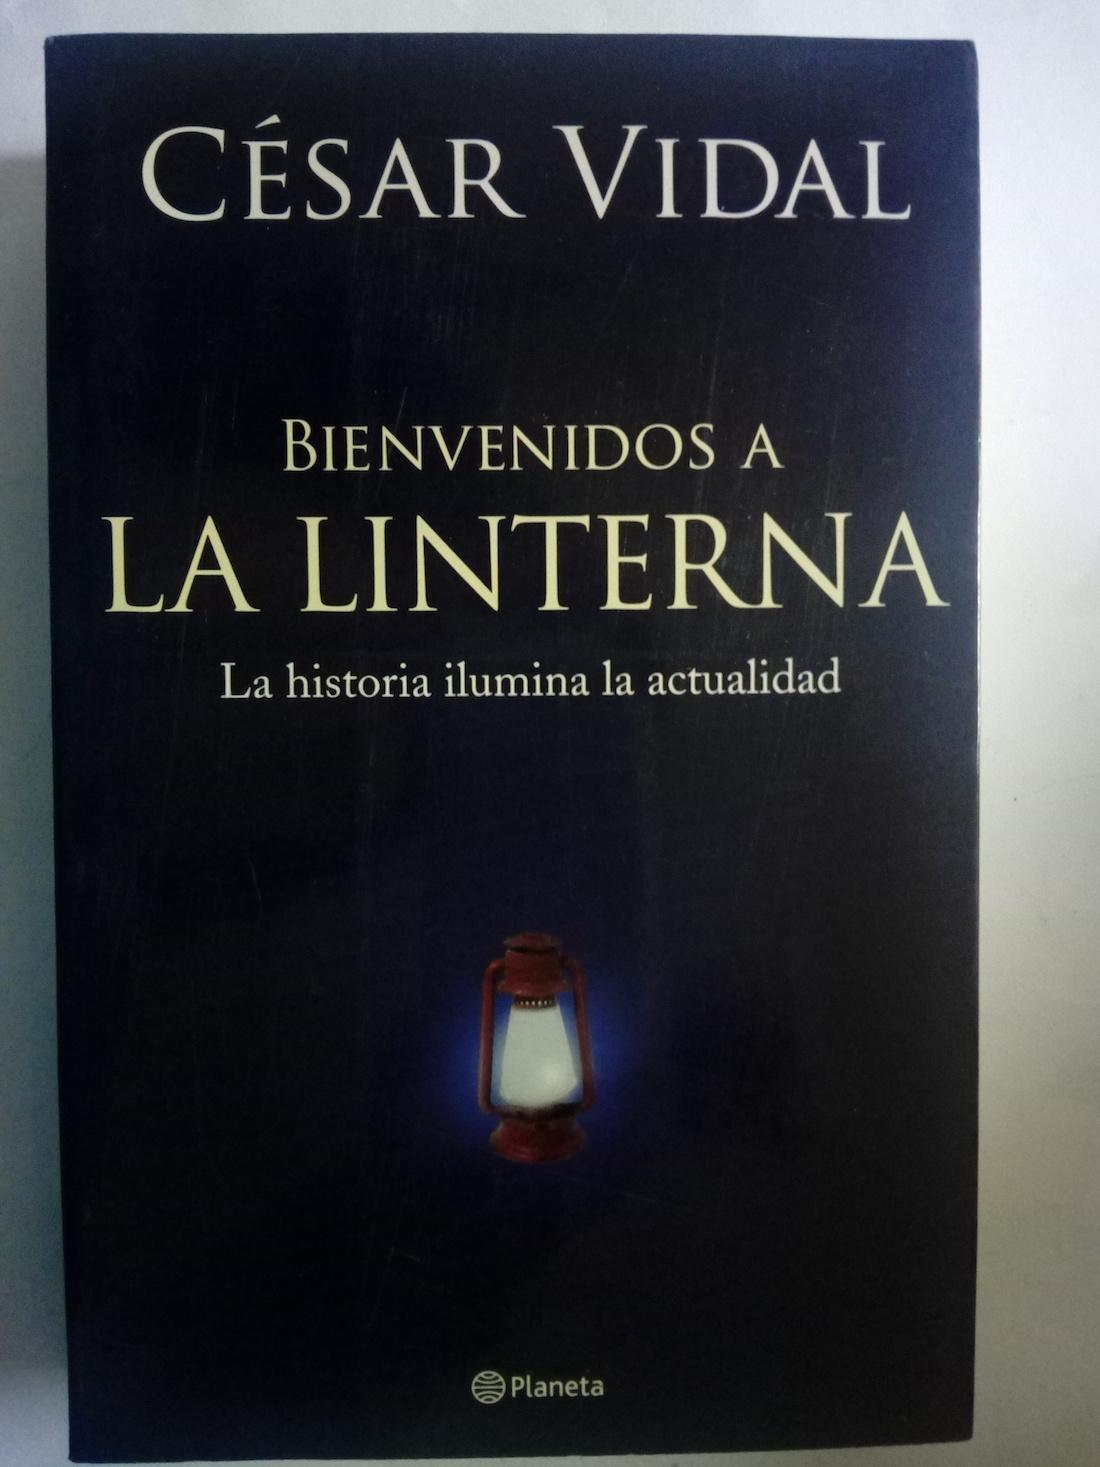 Bienvenidos a La Linterna. La historia ilumina la actualidad - César Vidal